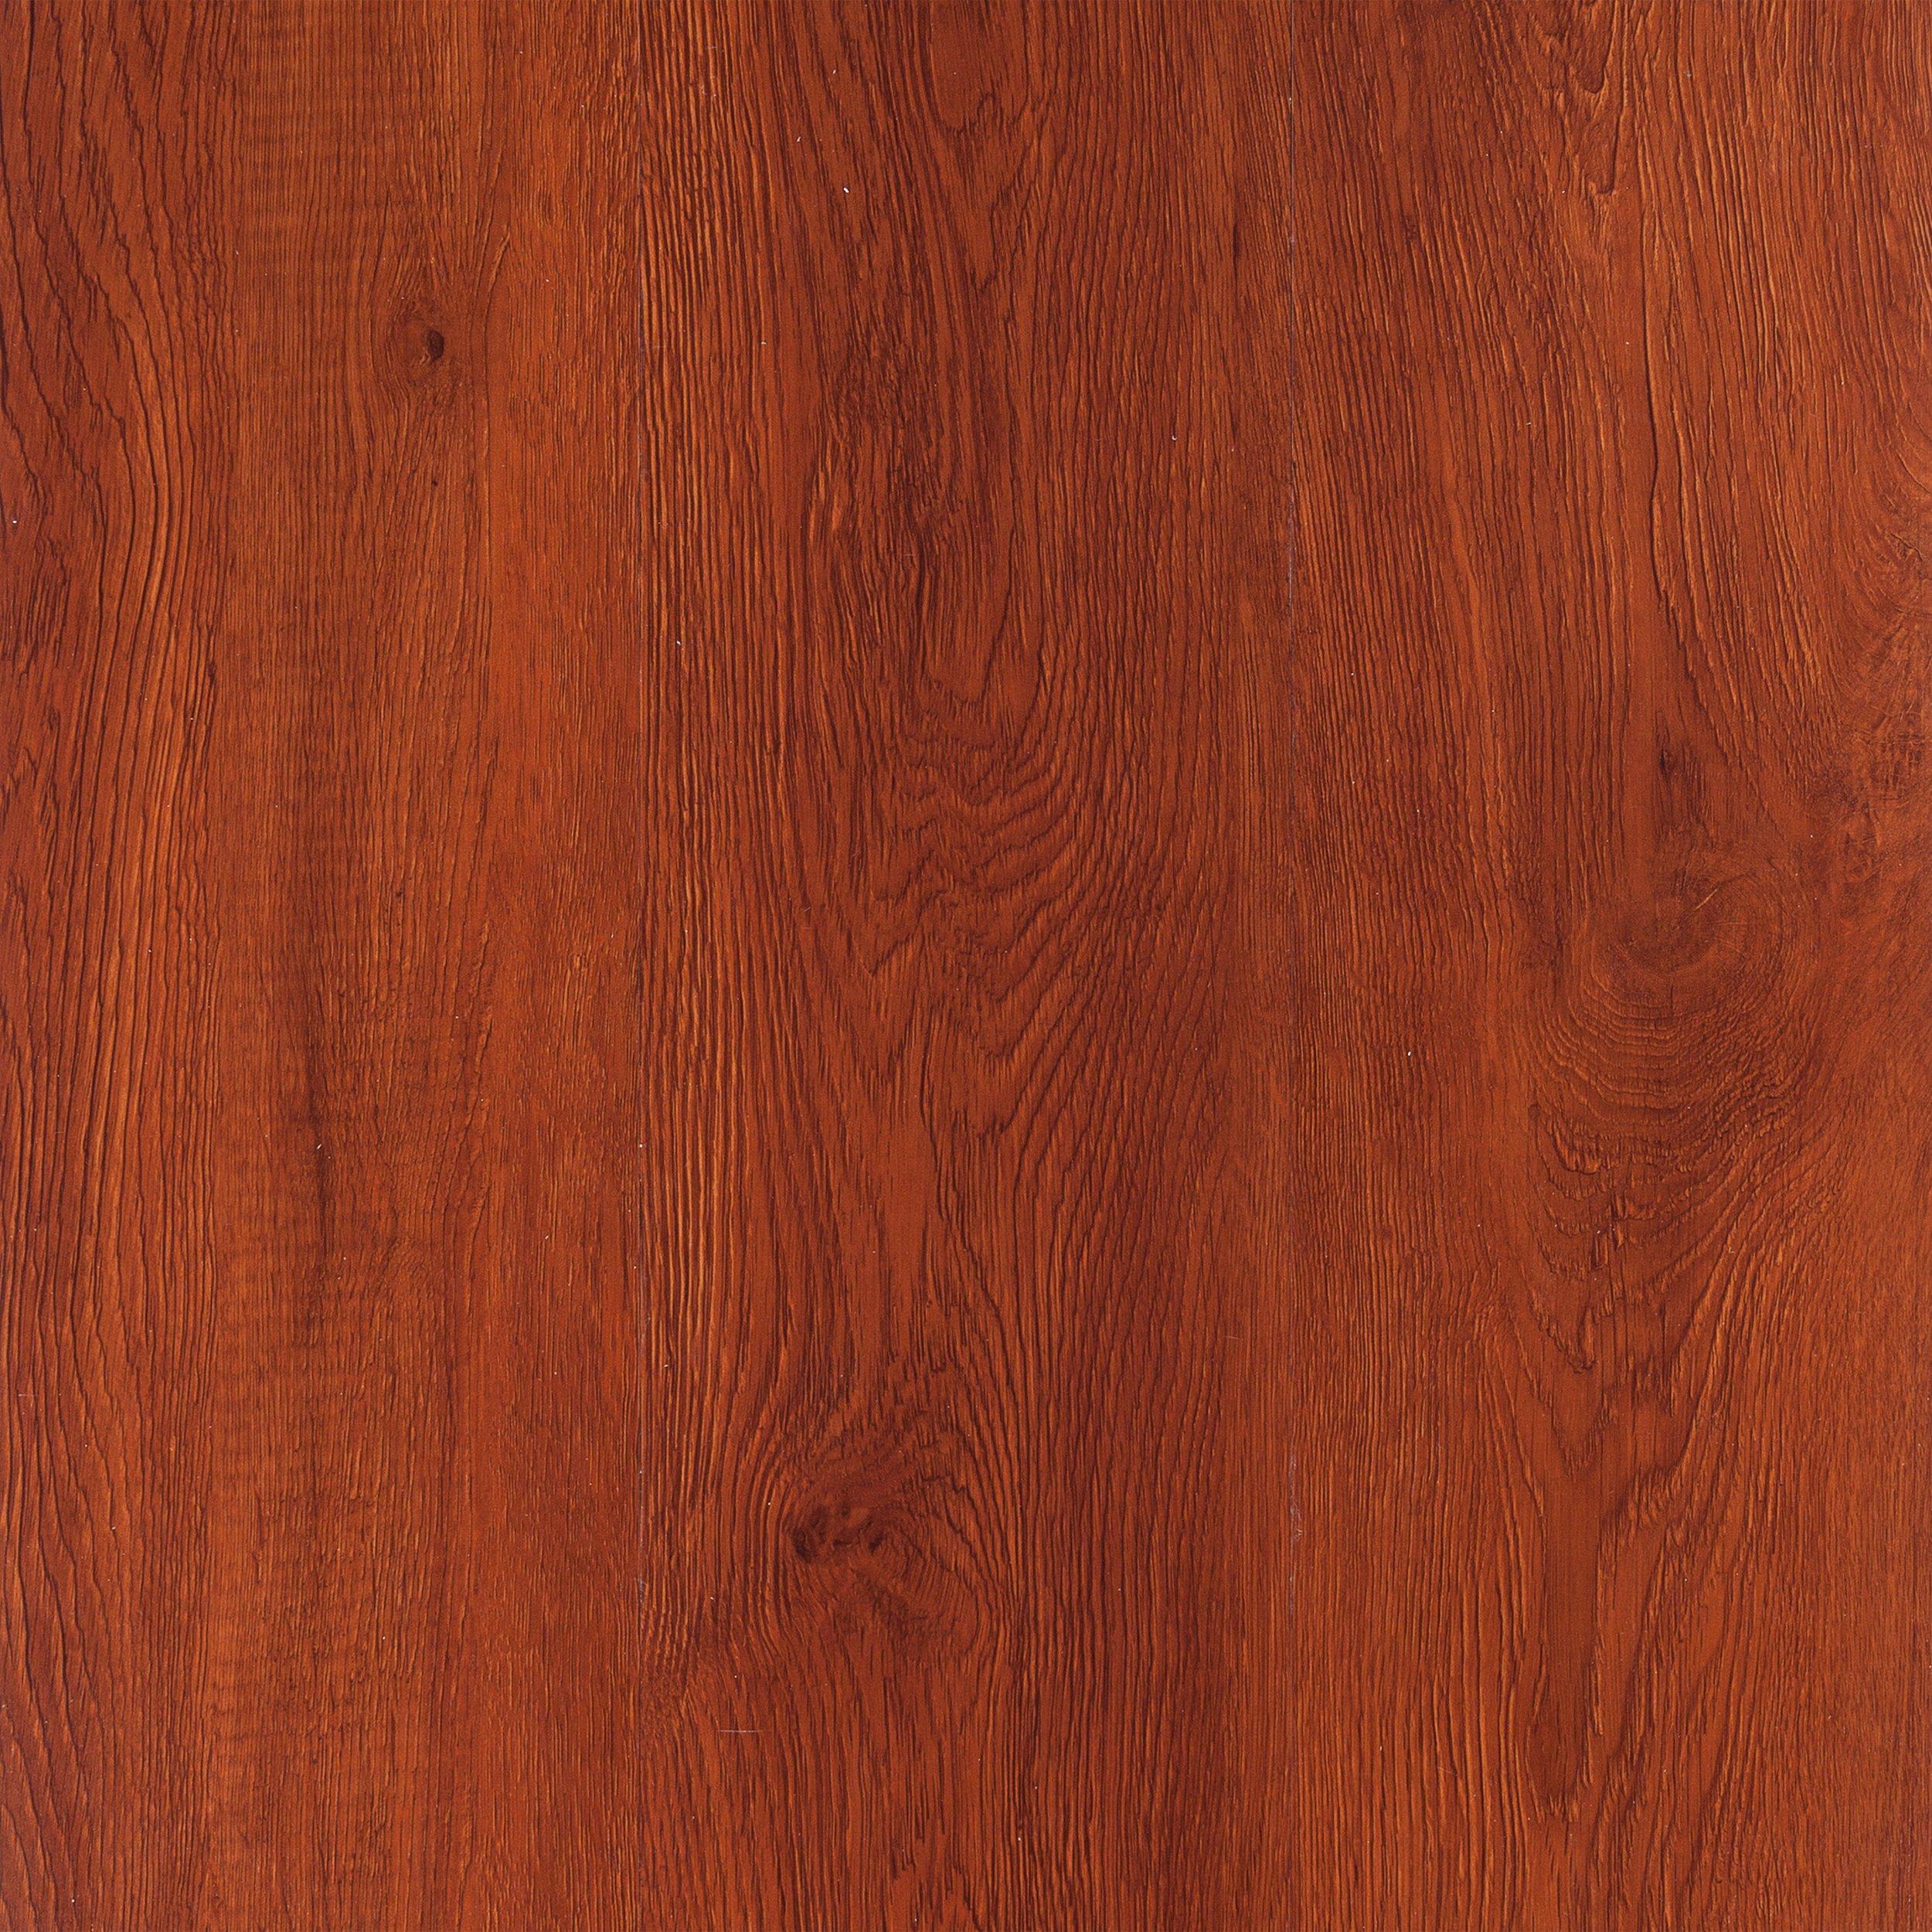 casa moderna brazil tigerwood vinyl plank 2mm floor and decor